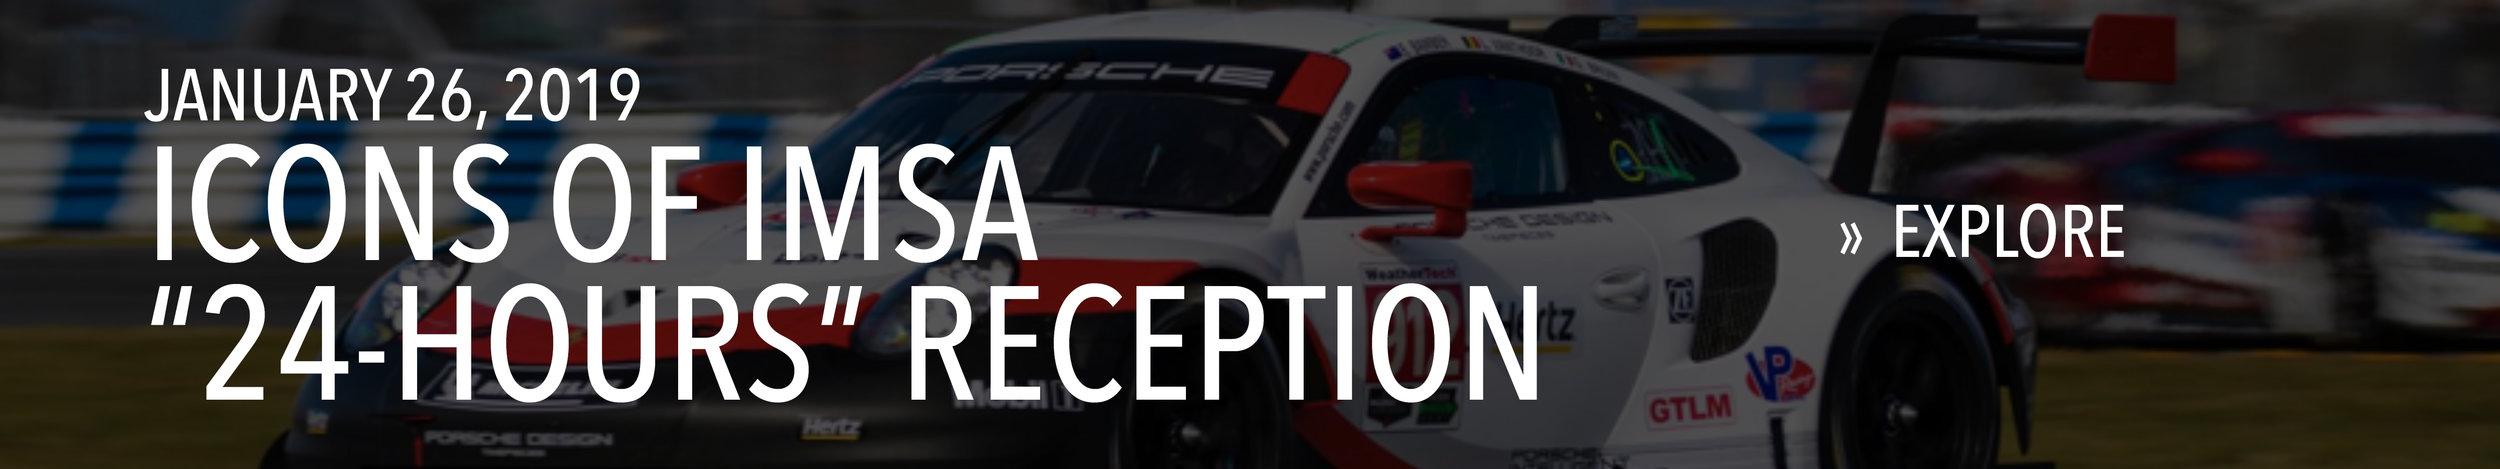 "Icons of IMSA ""24 Hours"" Reception on January 26, 2019"